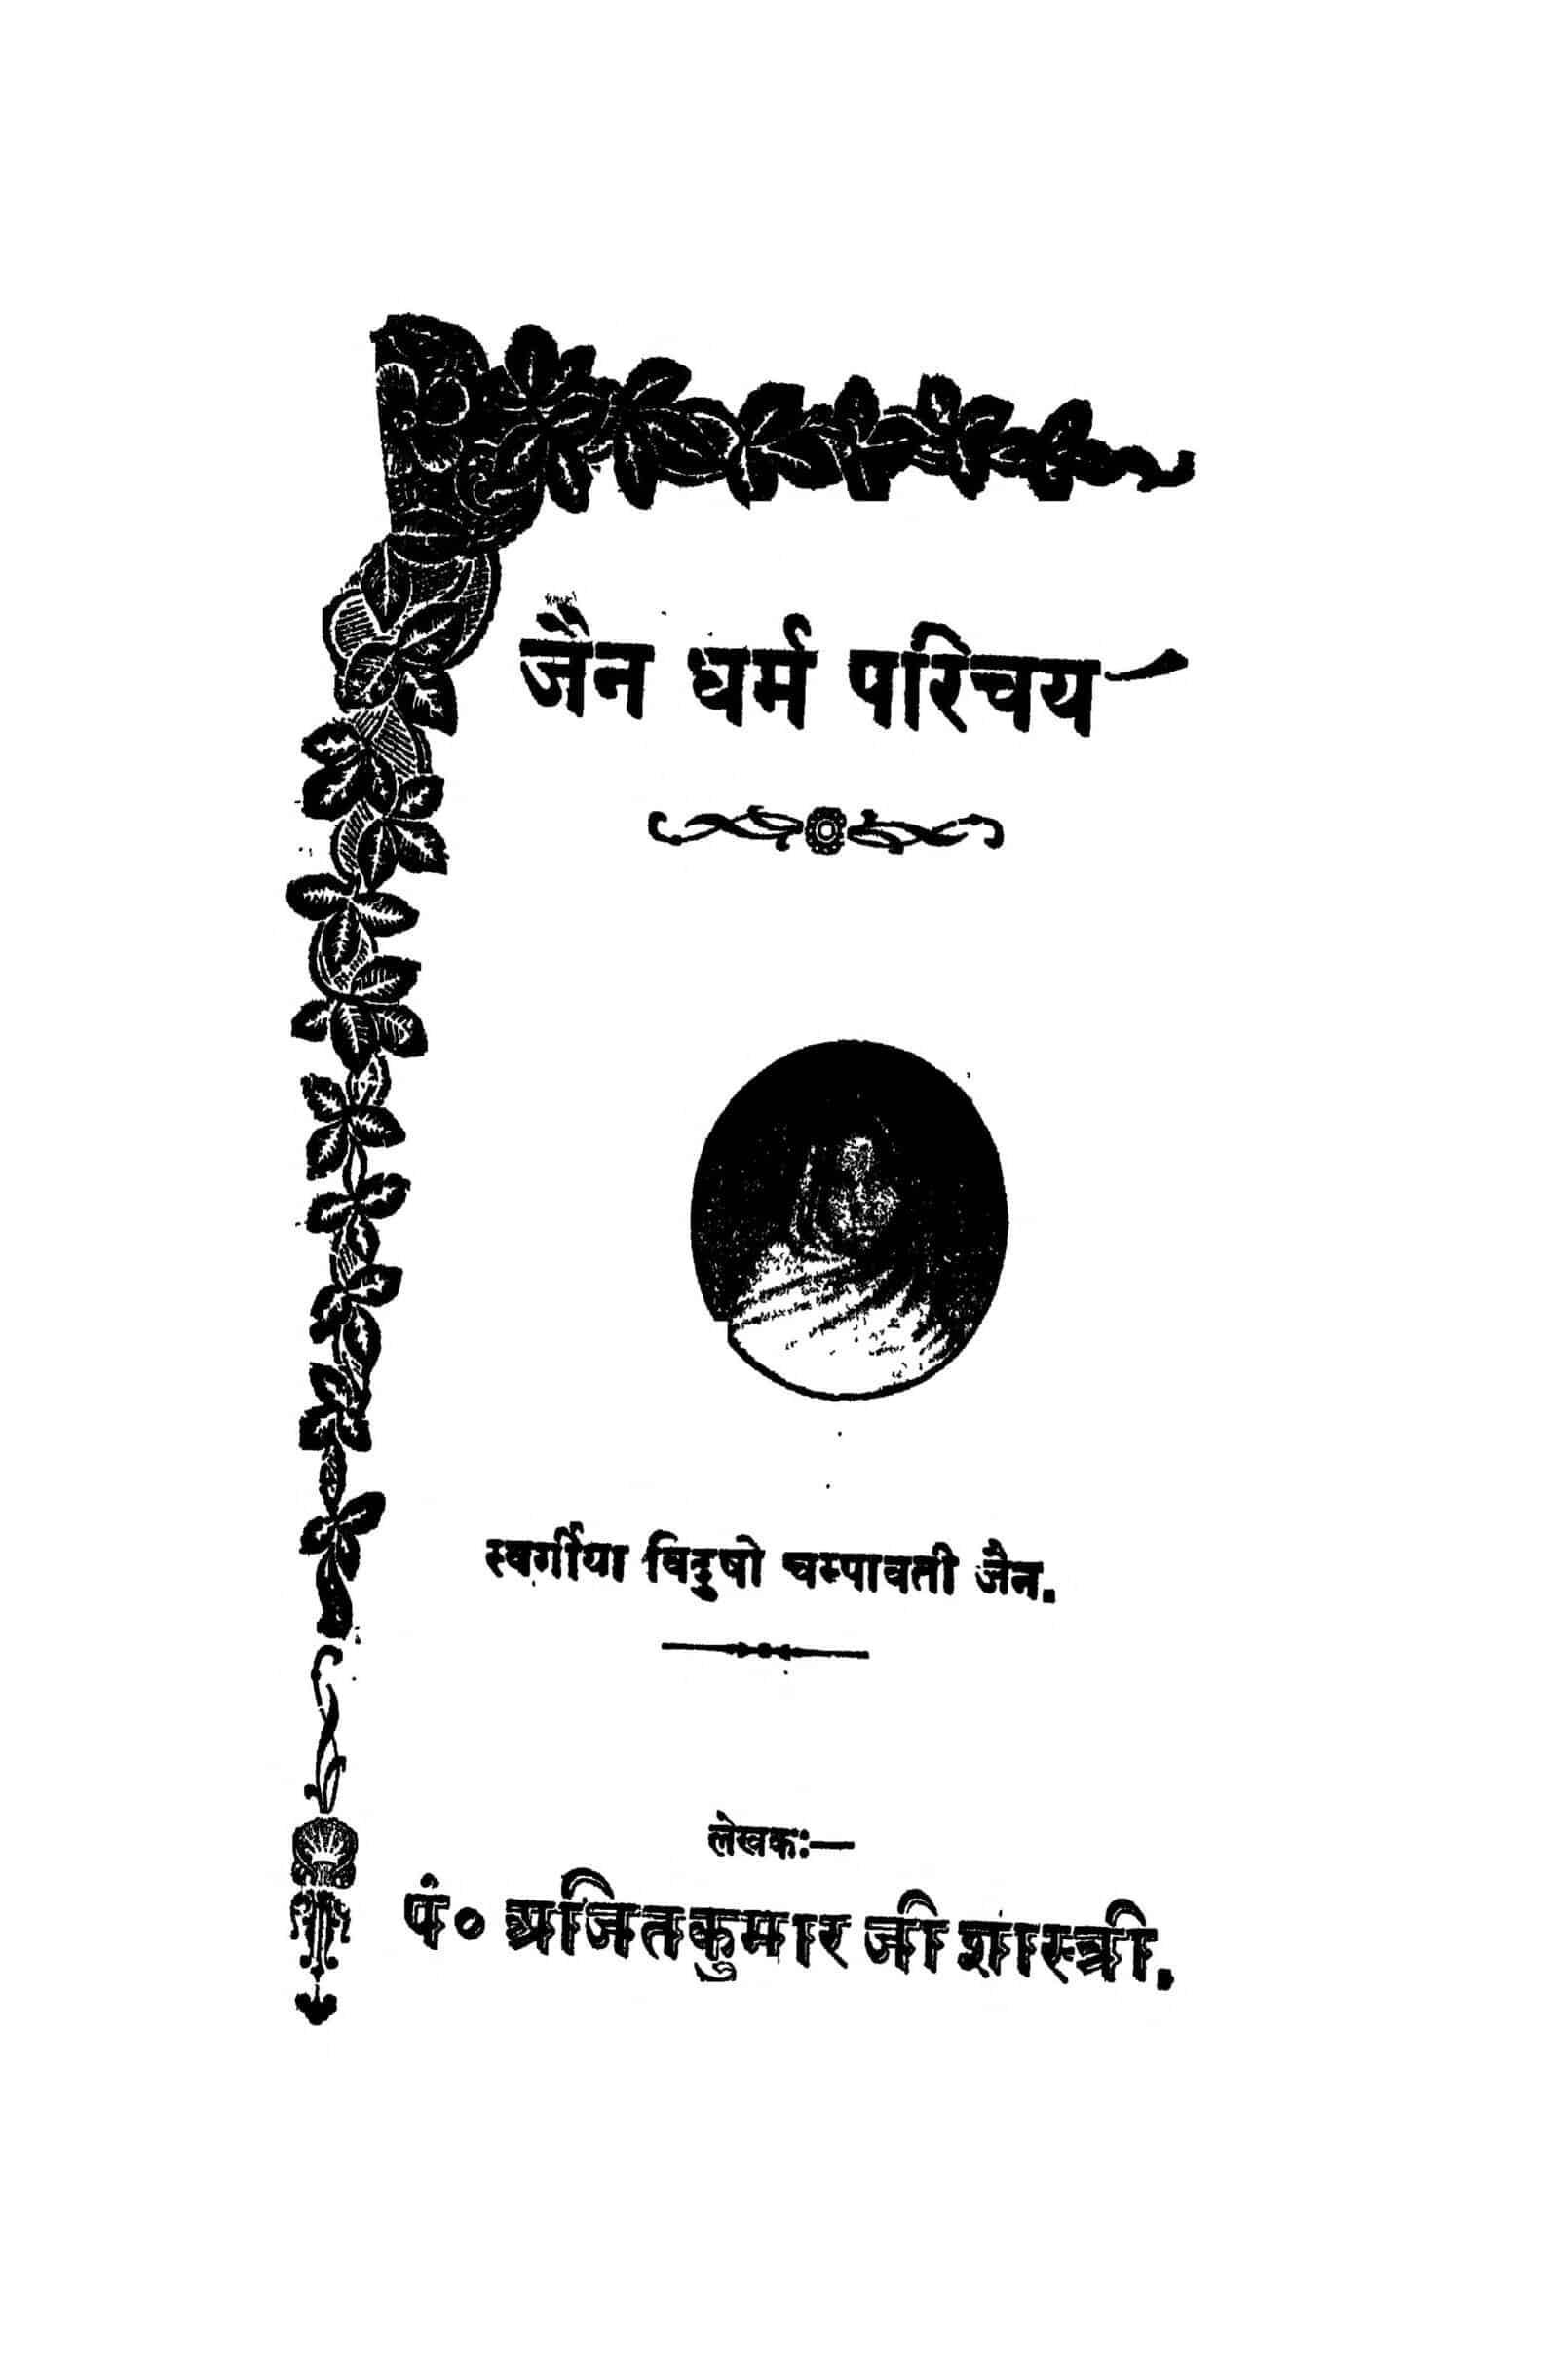 Book Image : जैन धर्म परिचय - Jain Dharm Parichay